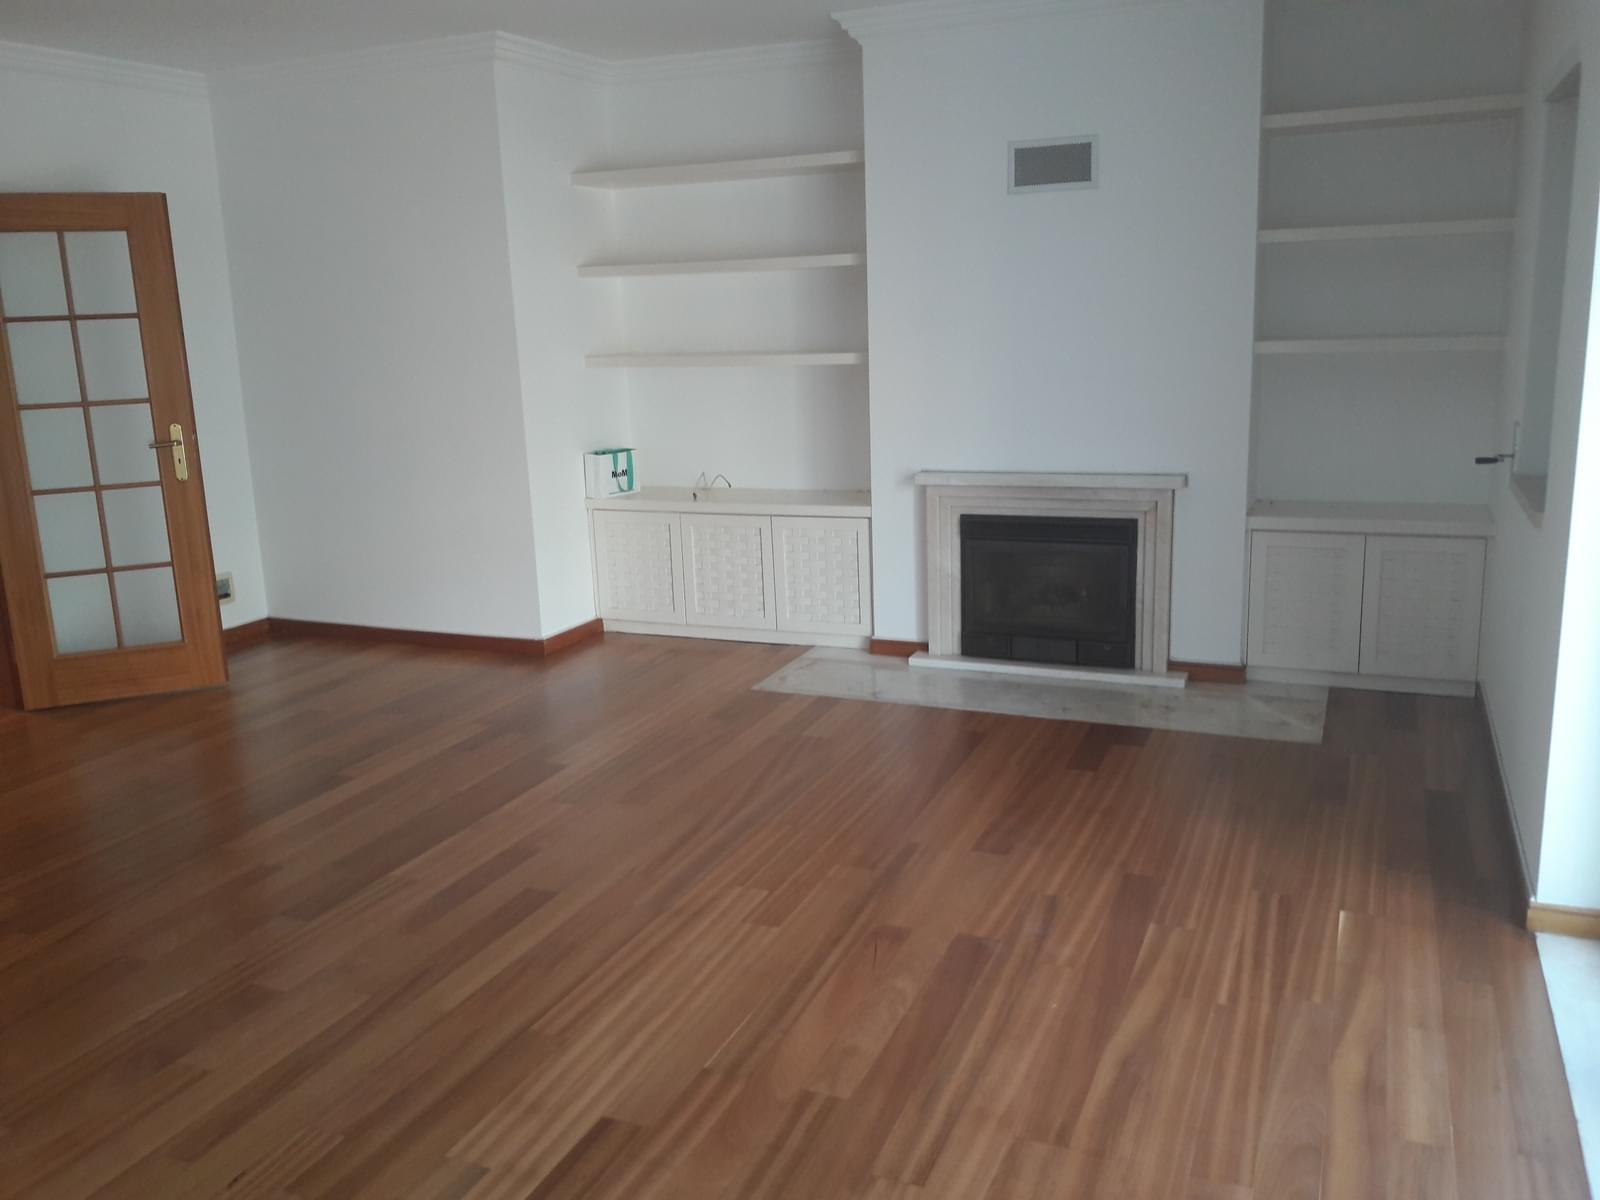 pf18038-apartamento-t3-0a0f2826-b6ab-4739-b44f-f0072c97324b